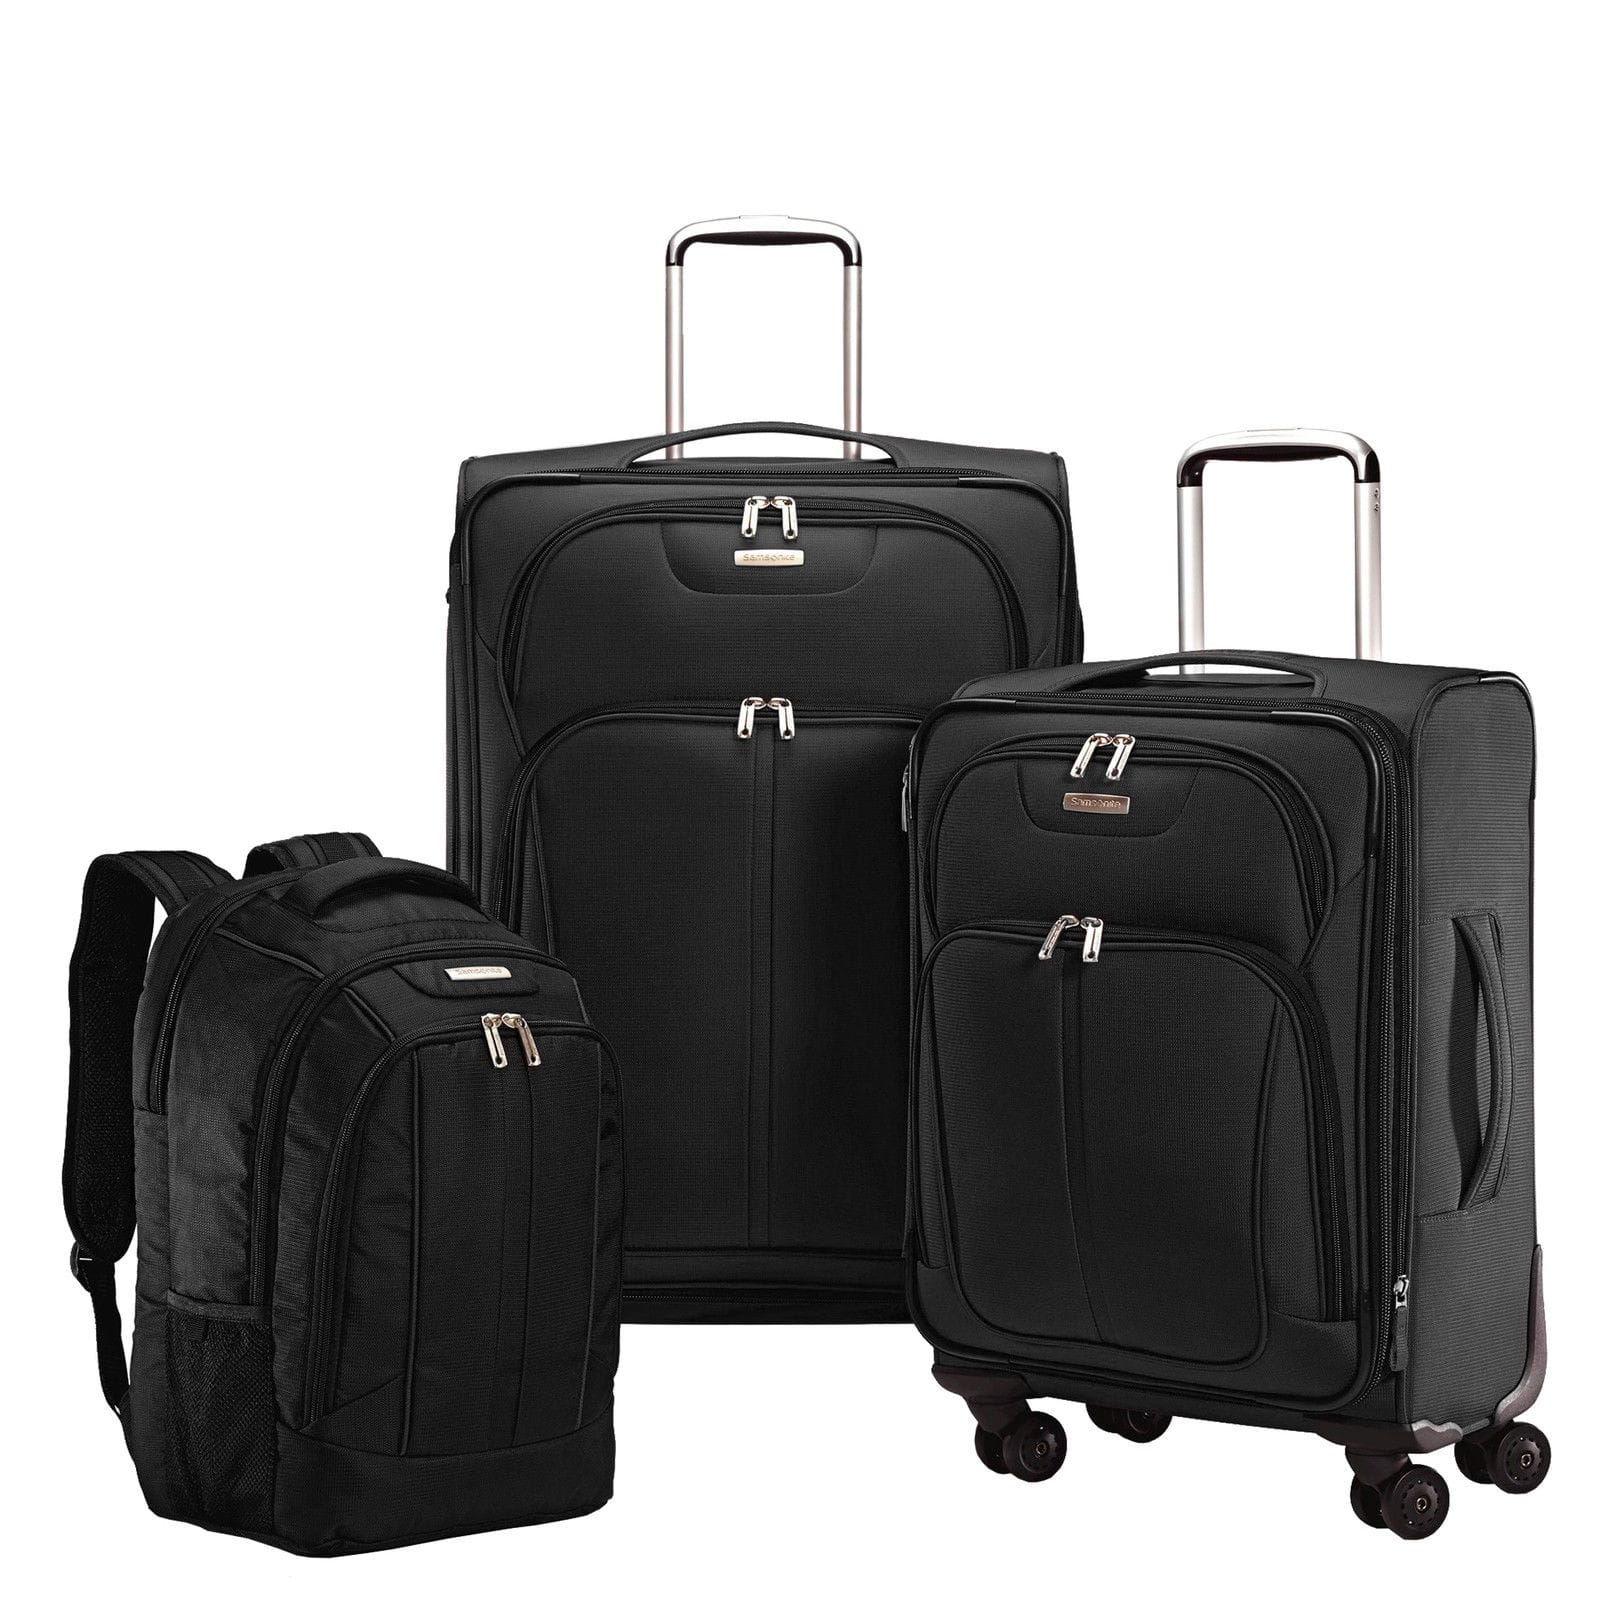 3-Piece Samsonite Versa-Lite 360 Nested Luggage Set (Black or Red ...